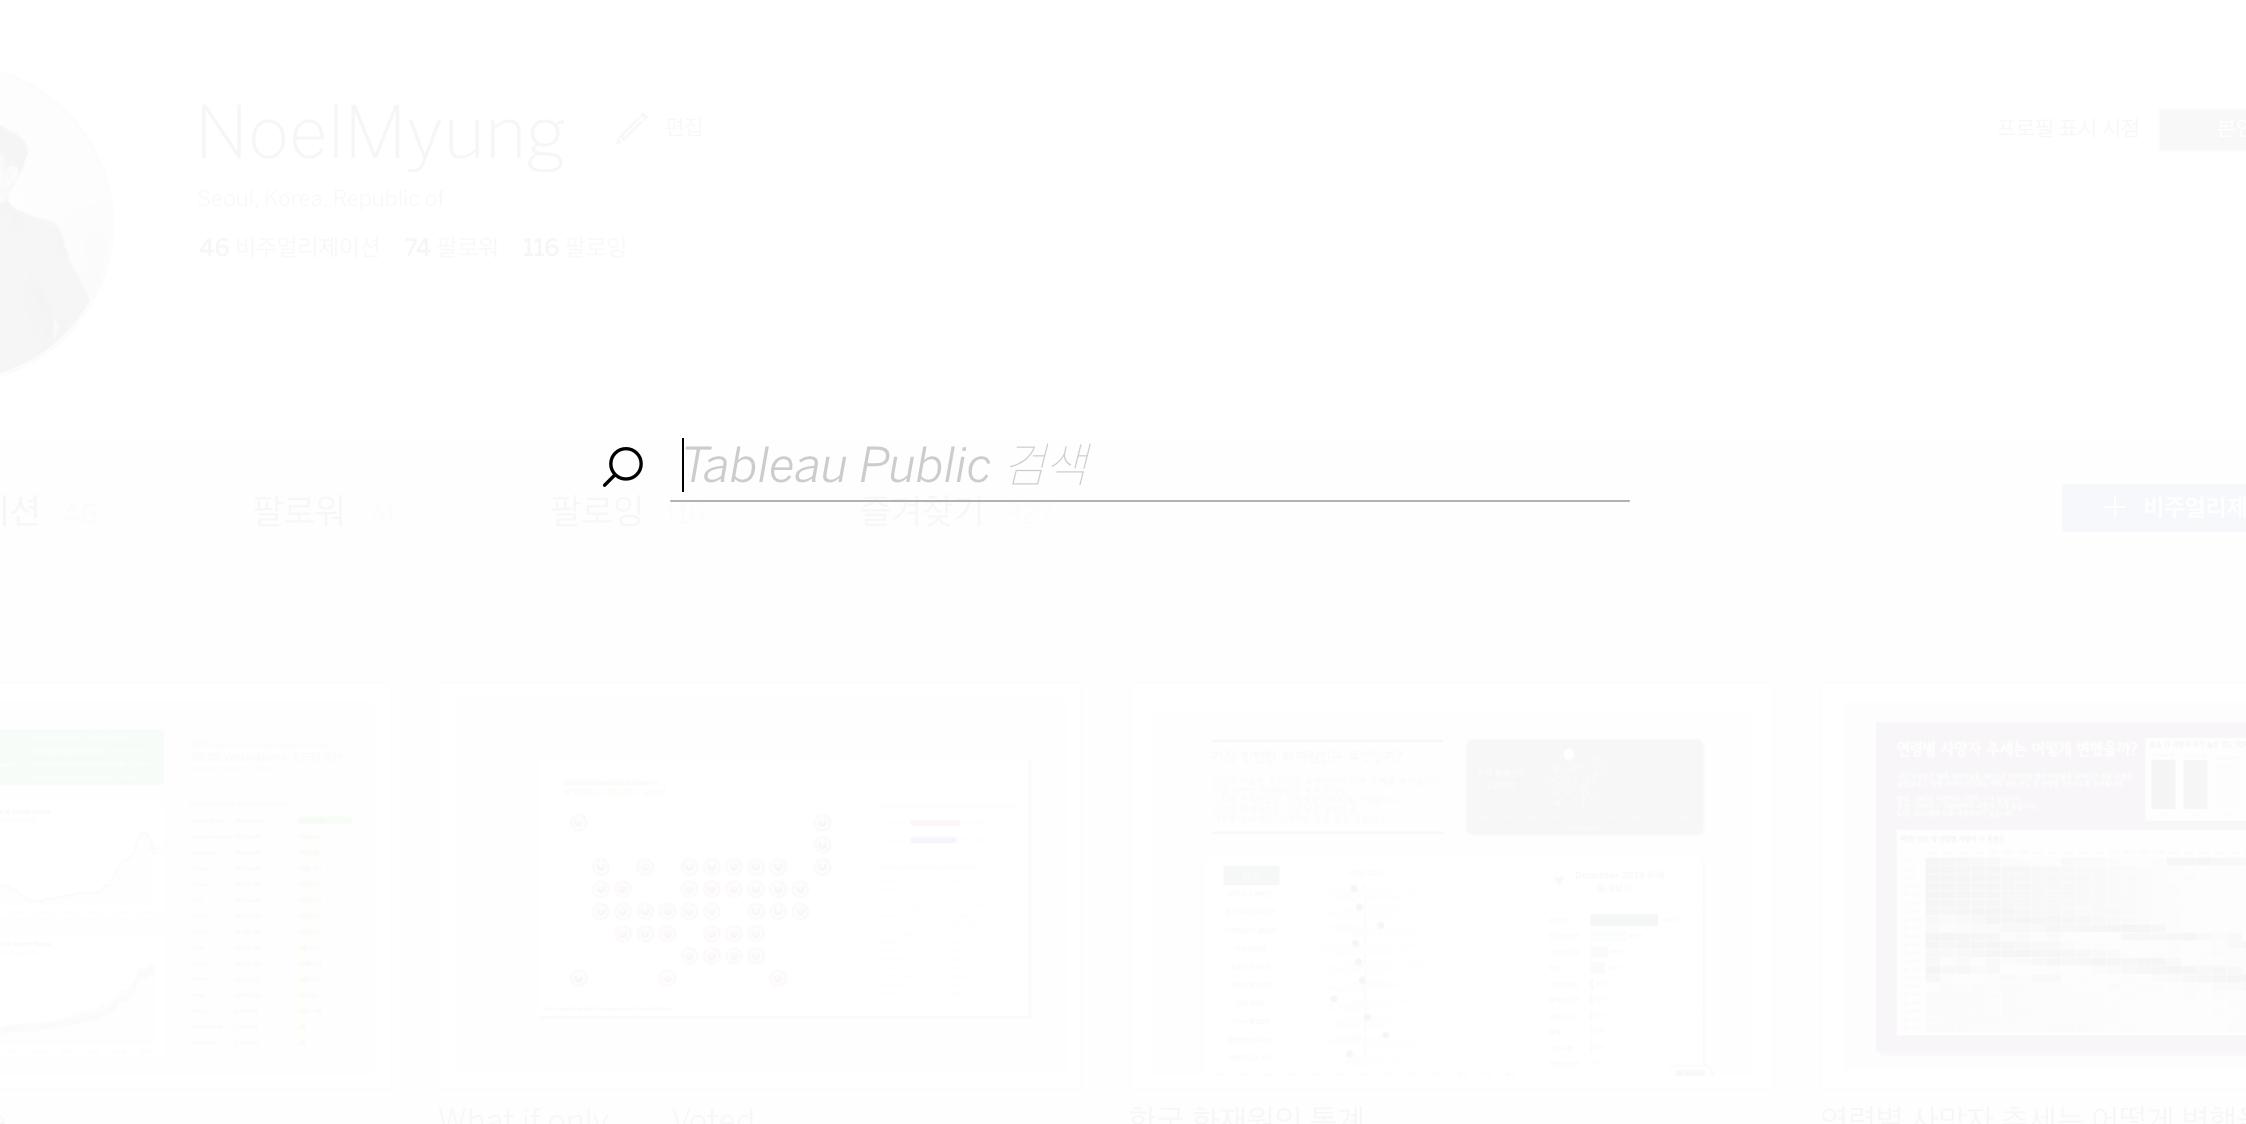 Tableau Public Search